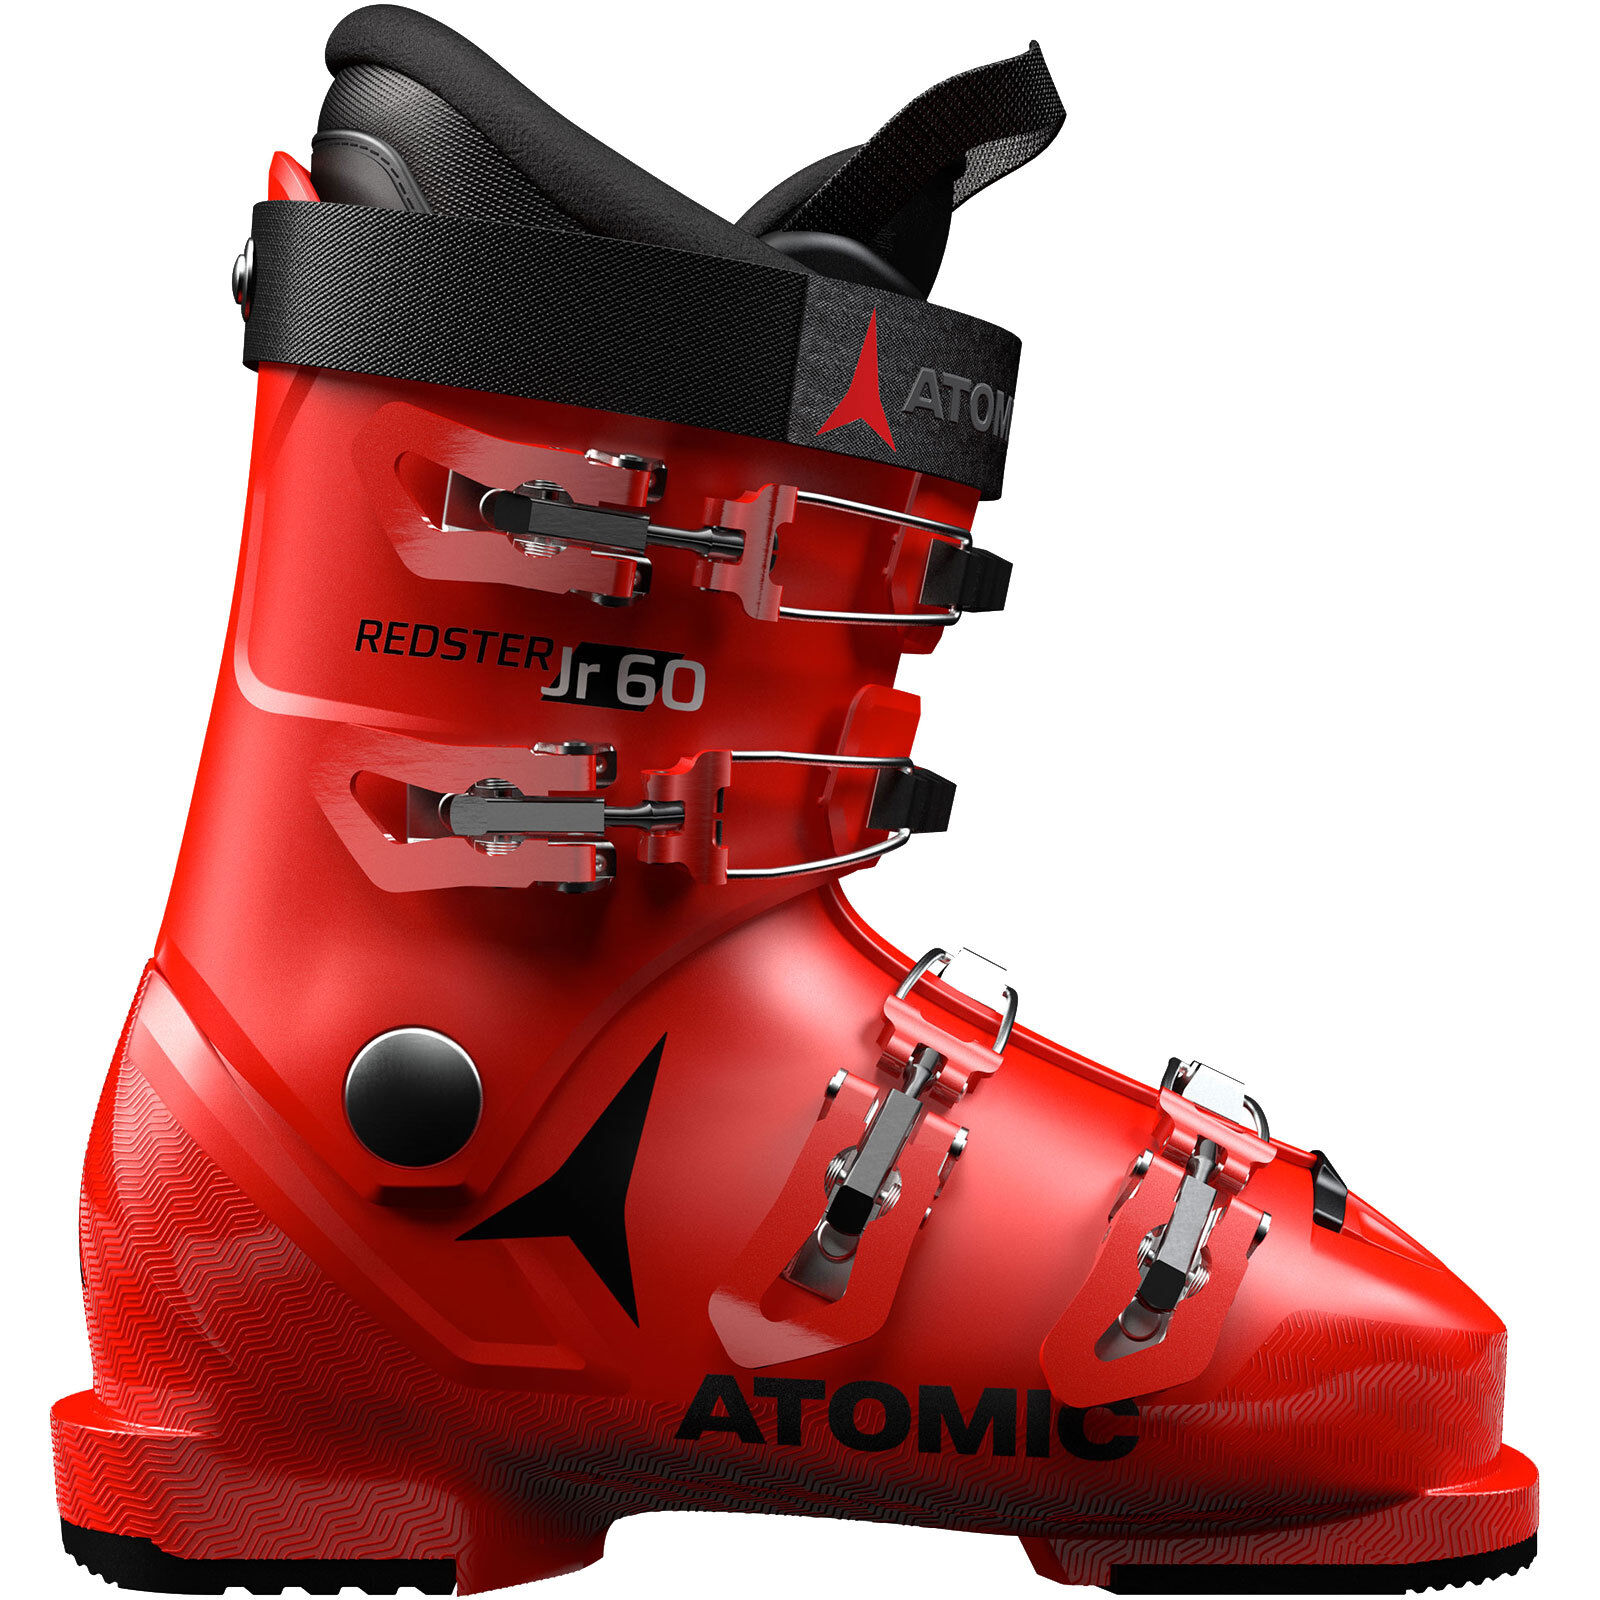 Atomic ROTster Junior 60 Ski-Stiefel Kinder Skischuhe Stiefel Skistiefel Skistiefel Skistiefel Alpin NEU cc3c84